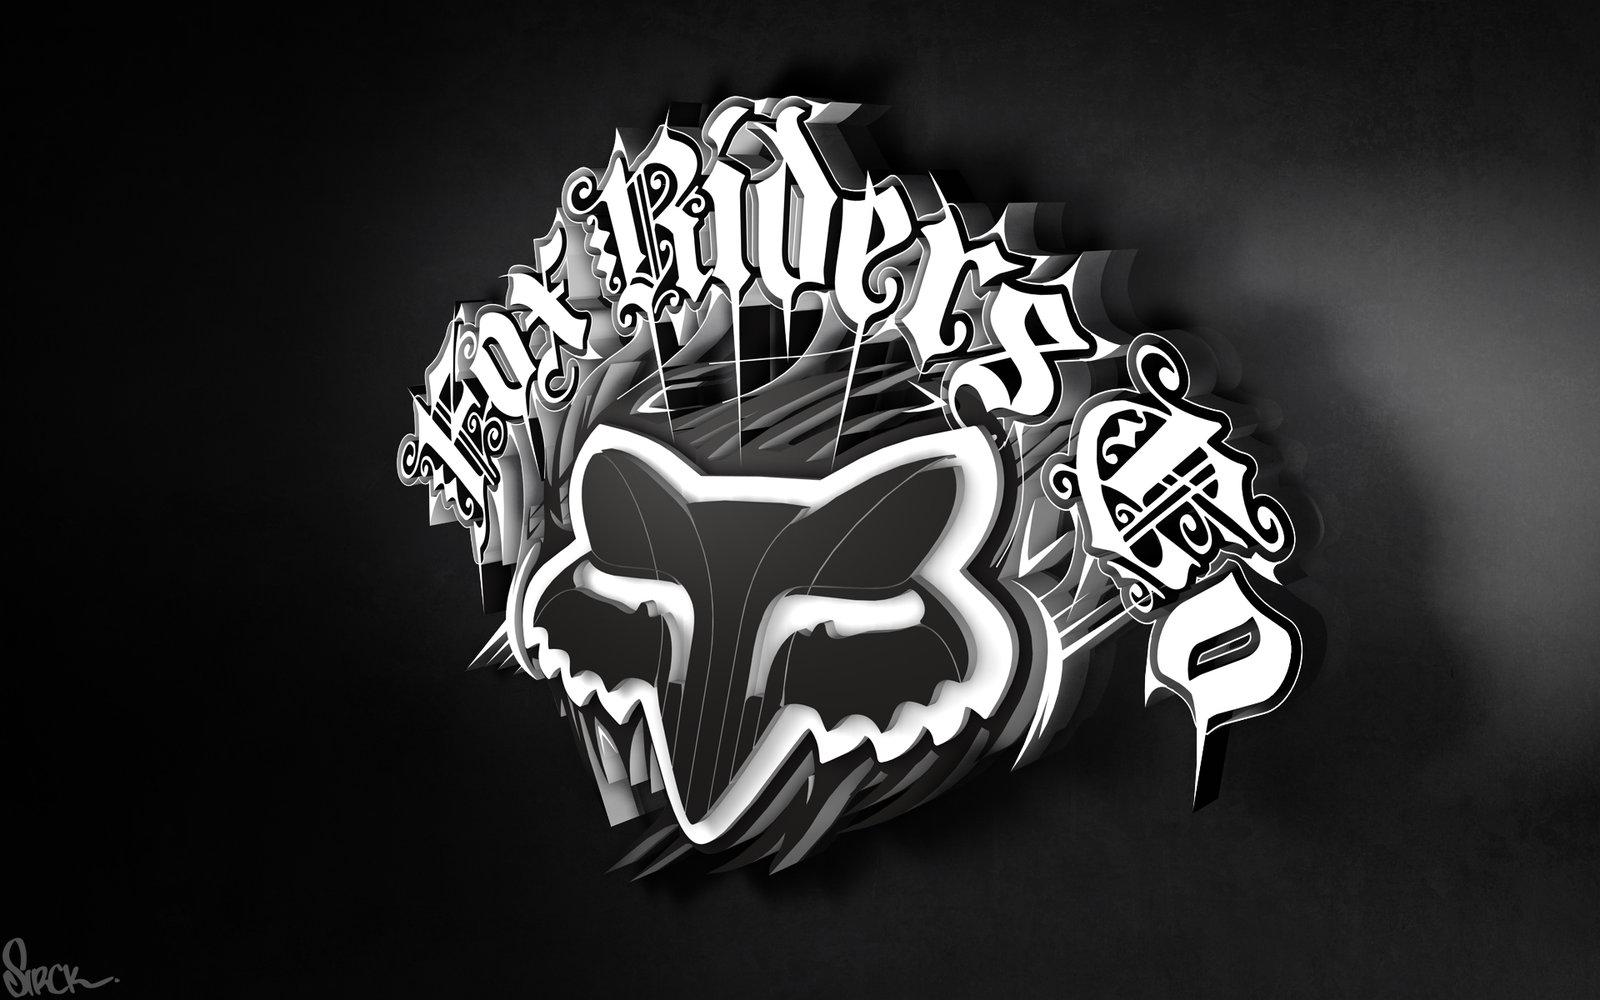 Fox Riders 3D Logo Wallpaper by small sk8er 1600x1000